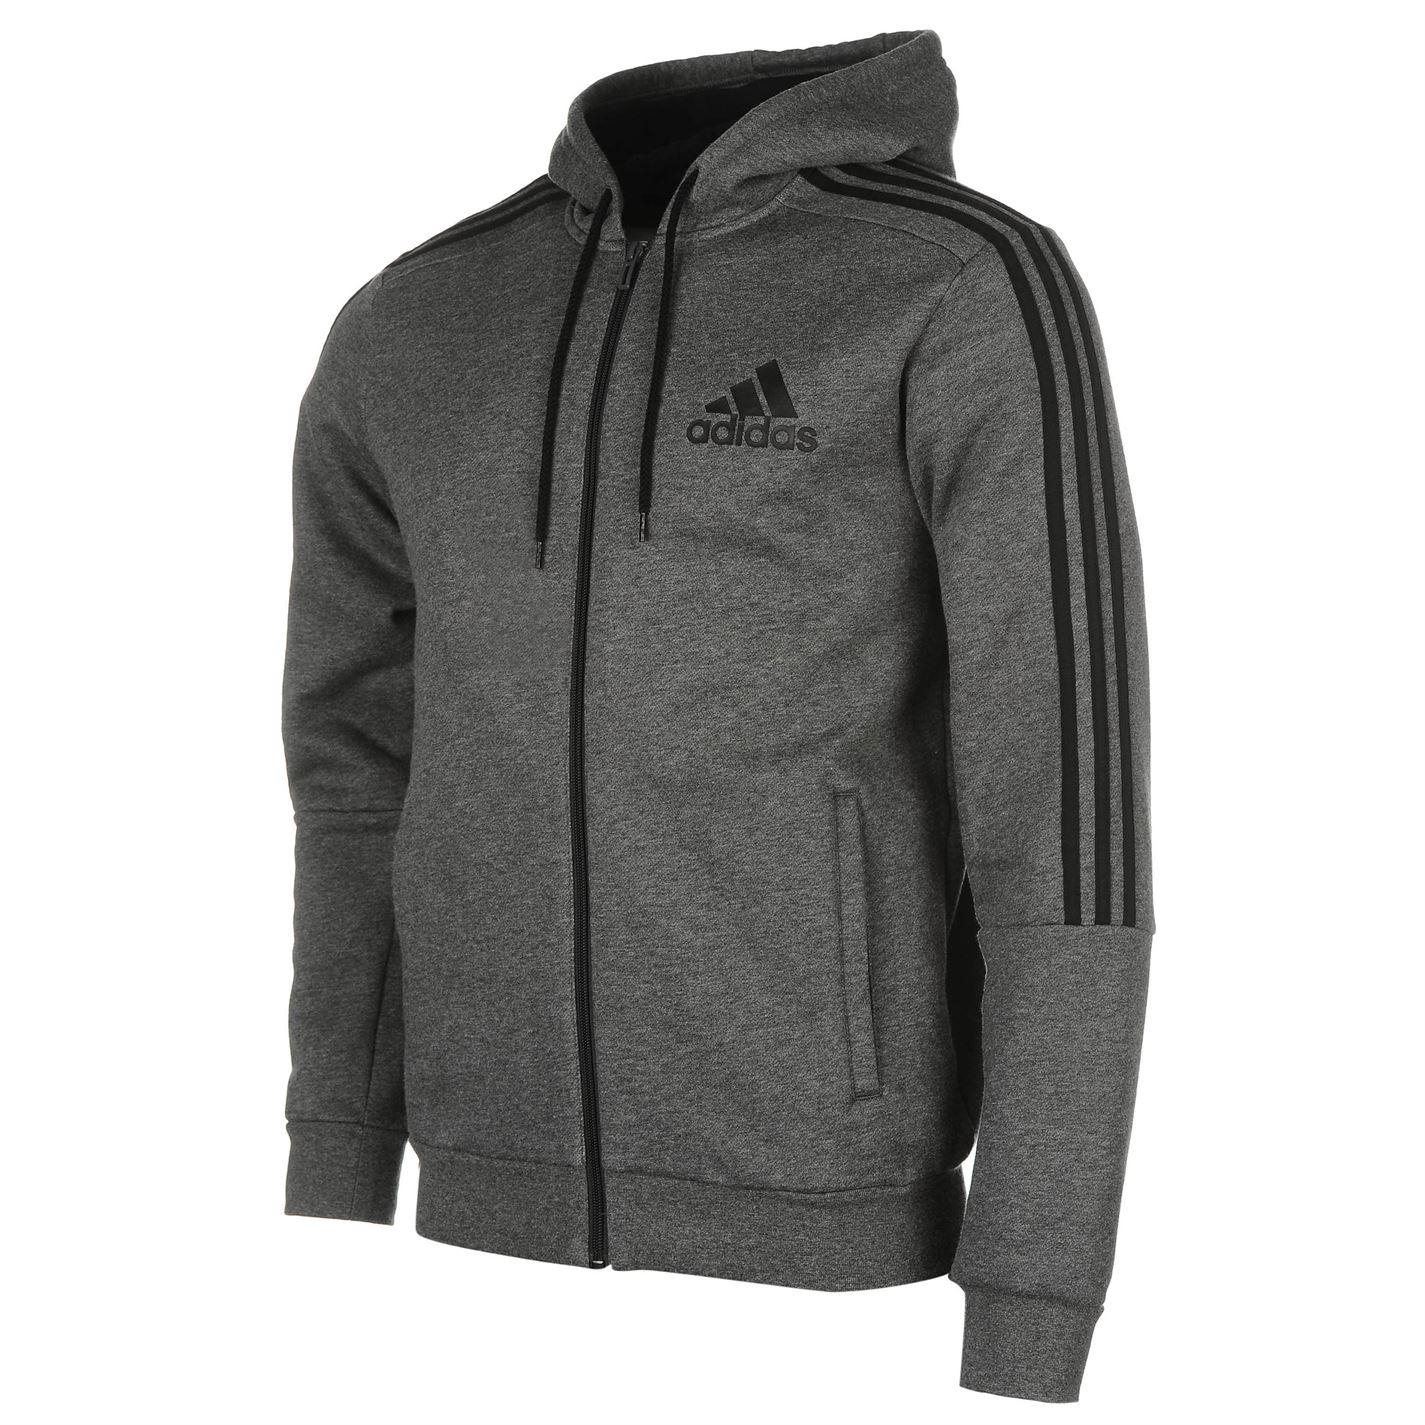 Adidas 3 Stripes Zip Through Hoody Mens